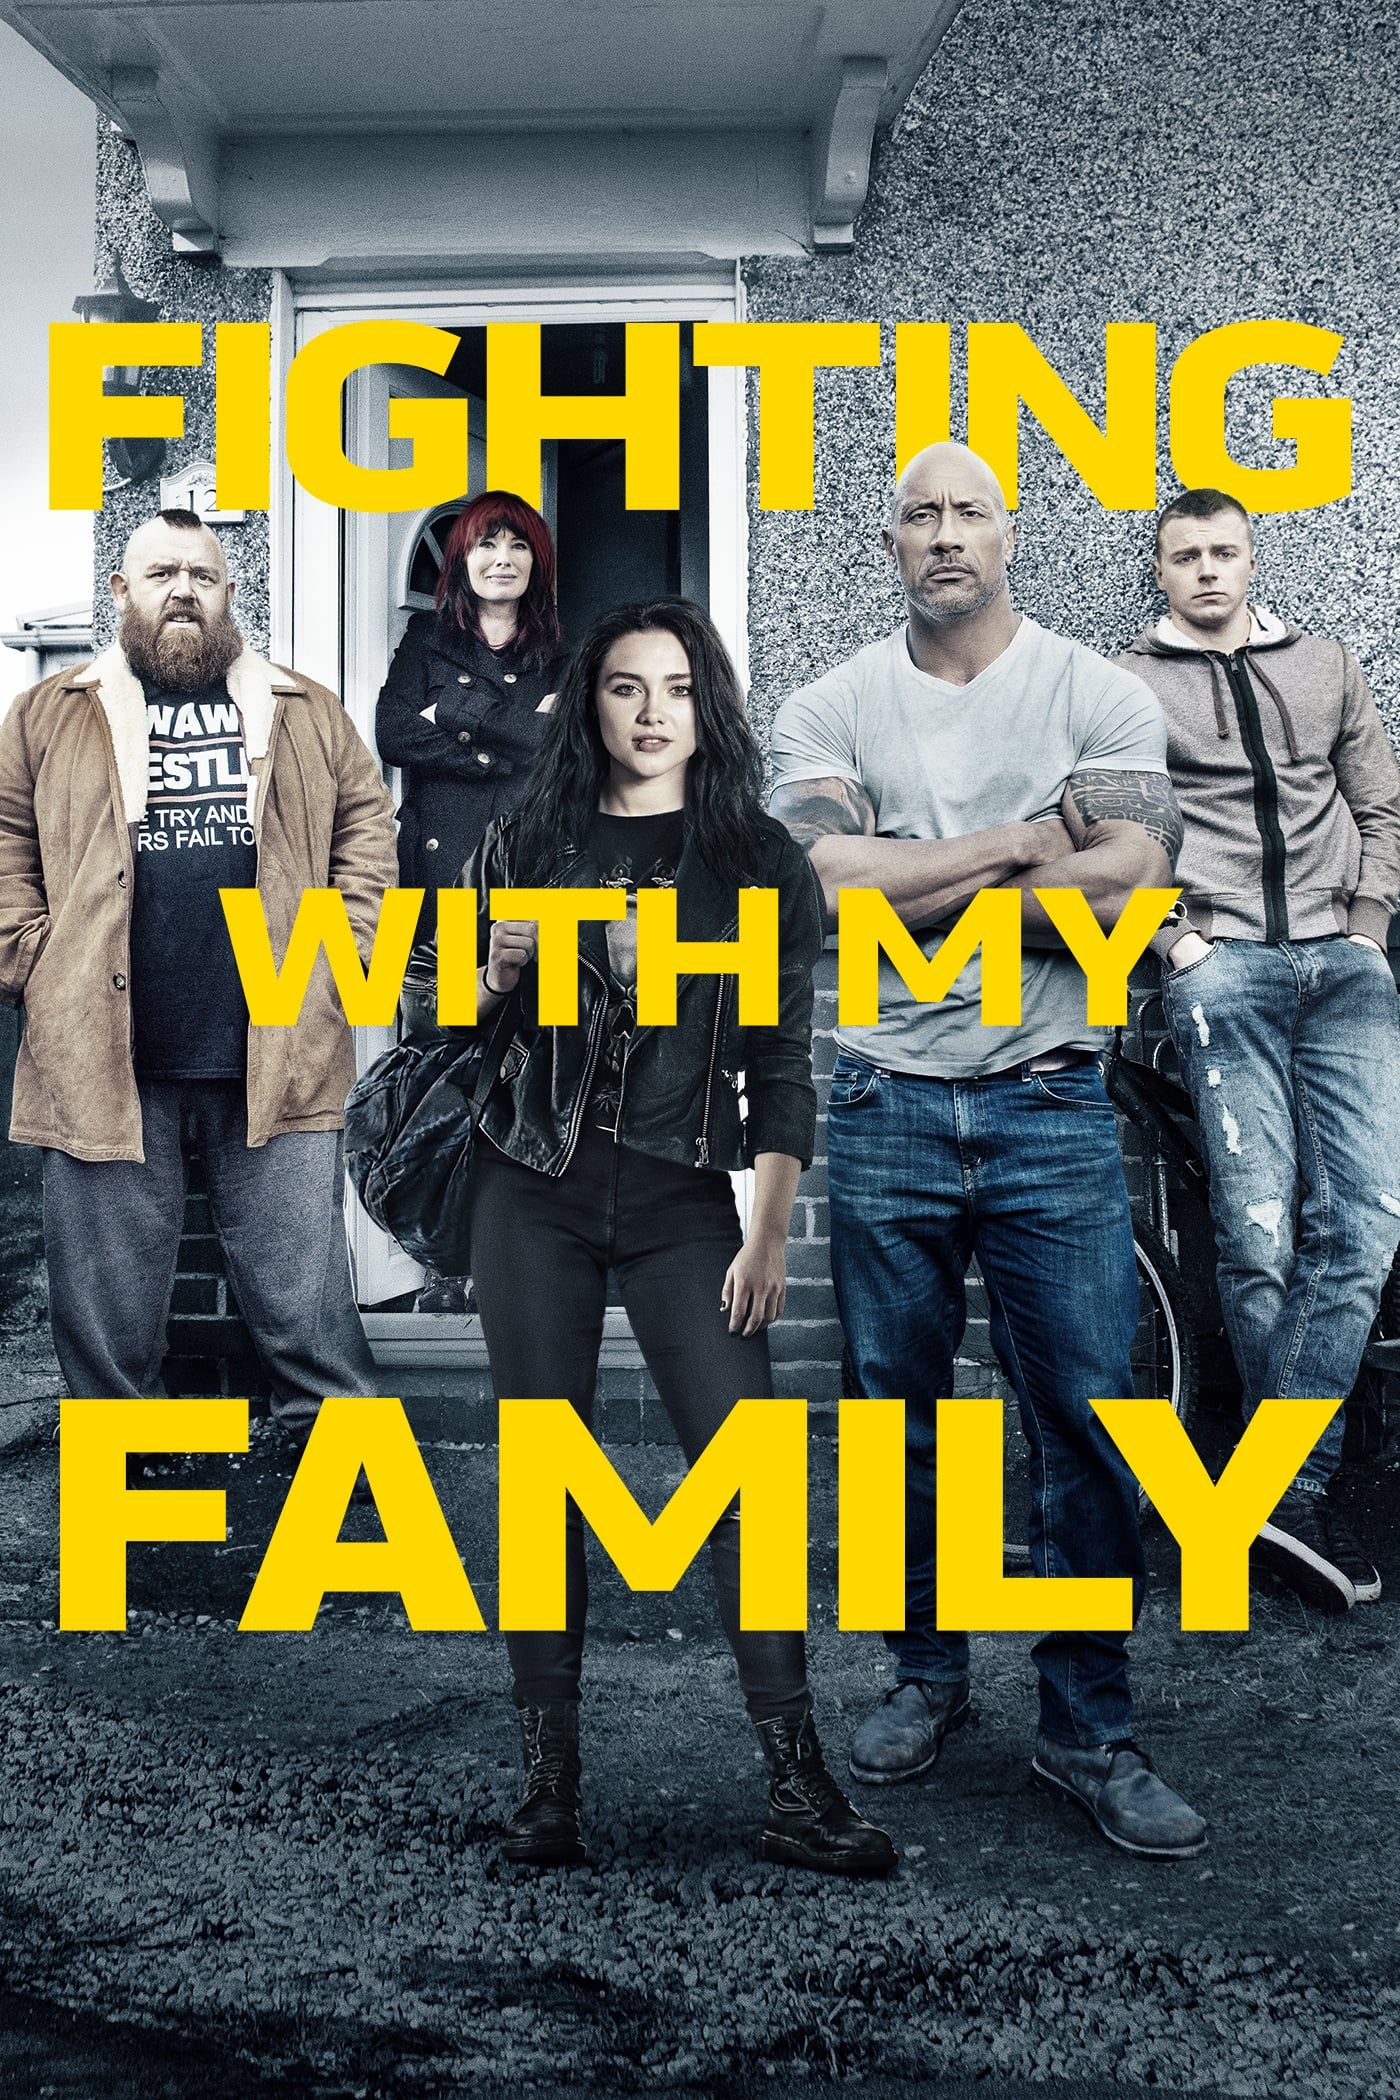 Fighting With My Family Pelicula Completa En Español Latino Gratis Online Peliculas En Cine Calidad 2019 In 2020 My Family Movie Family Movies Free Movies Online